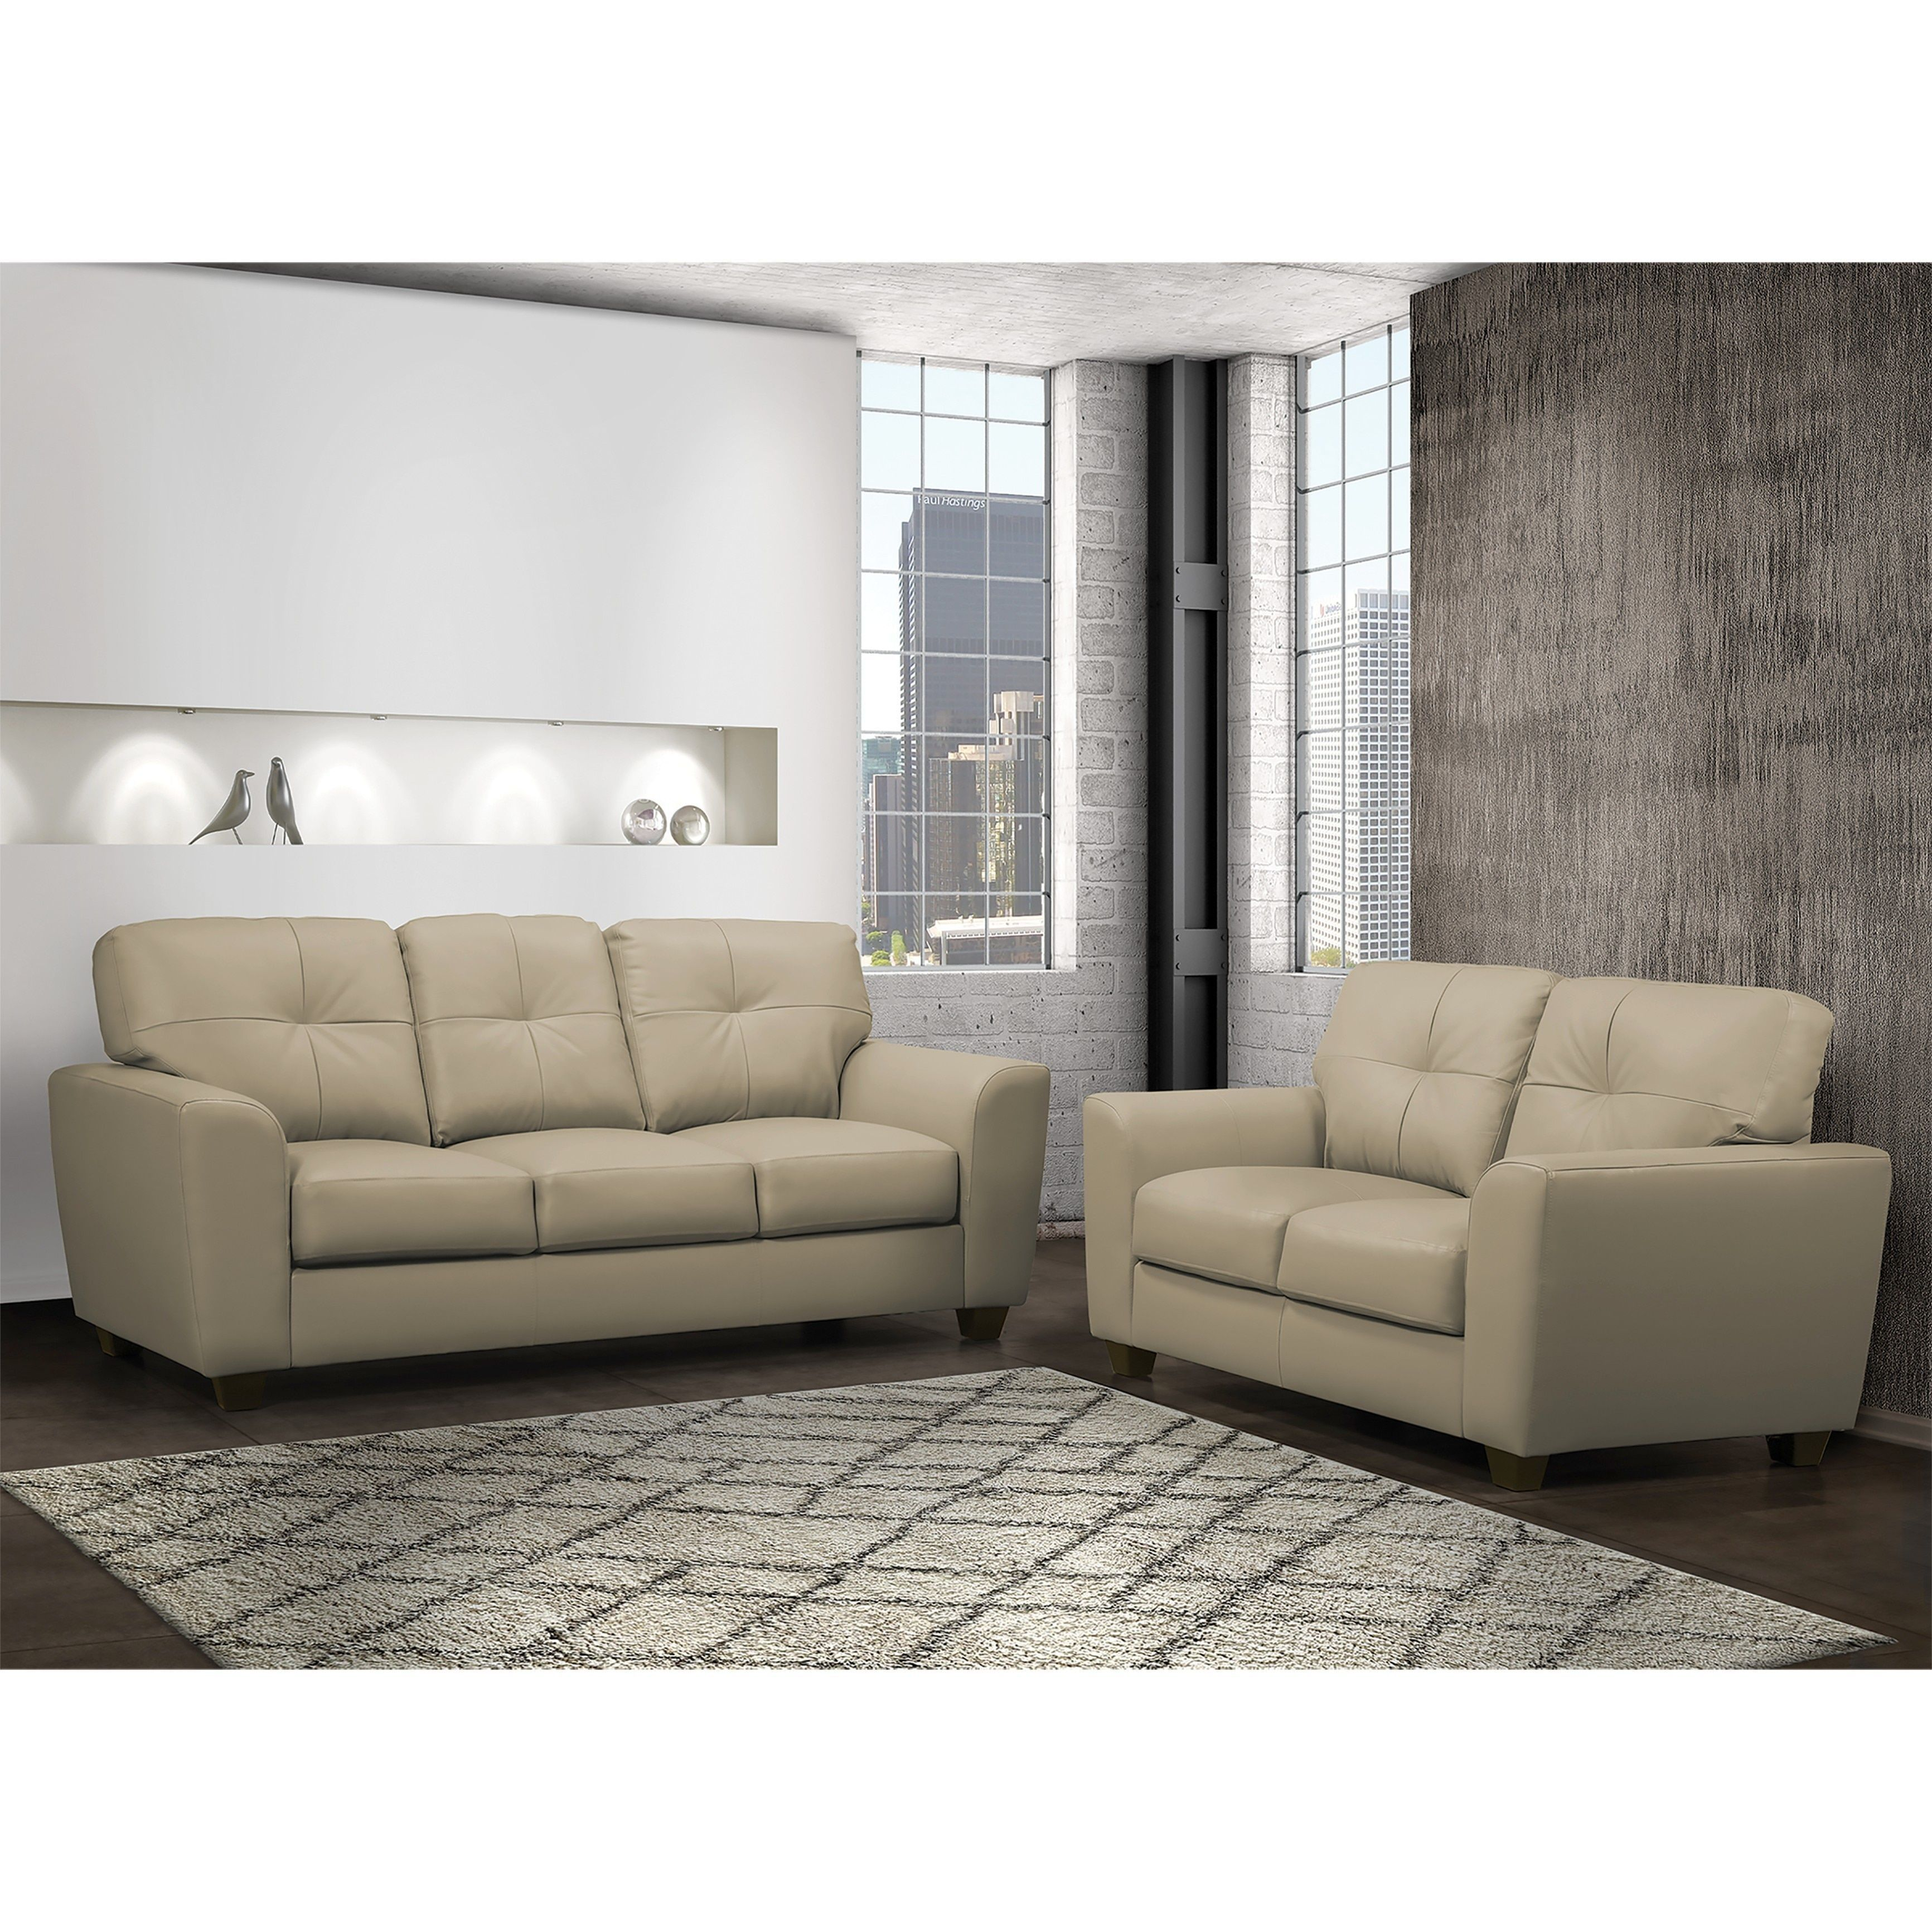 bahama taupe brown top grain leather sofa and loveseat set rh pinterest com